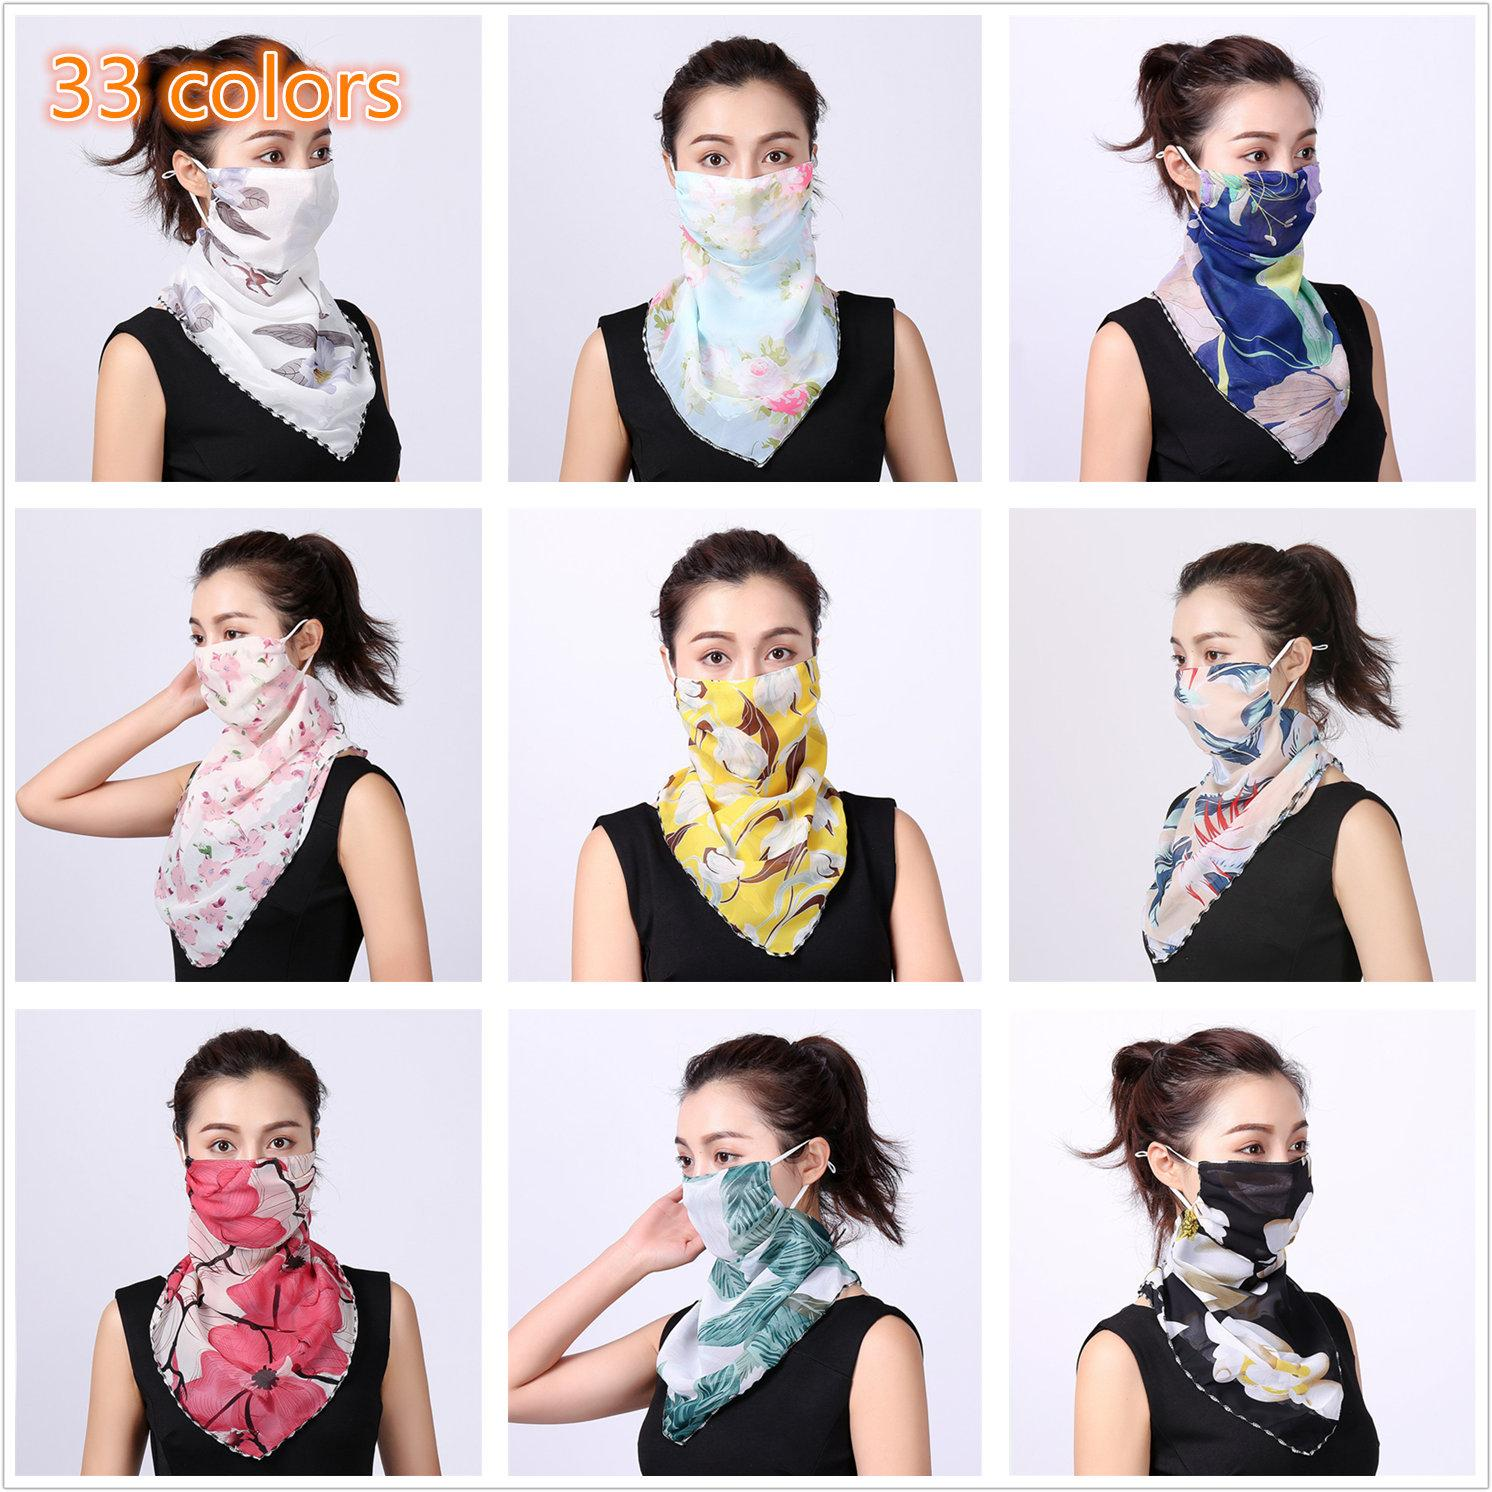 Sunscreen Velo Women Silk Bufanda 2020 Nuevo Cuello Protector Cubierta Cara Mascarilla Fina Riding UV Protección Oído Máscara